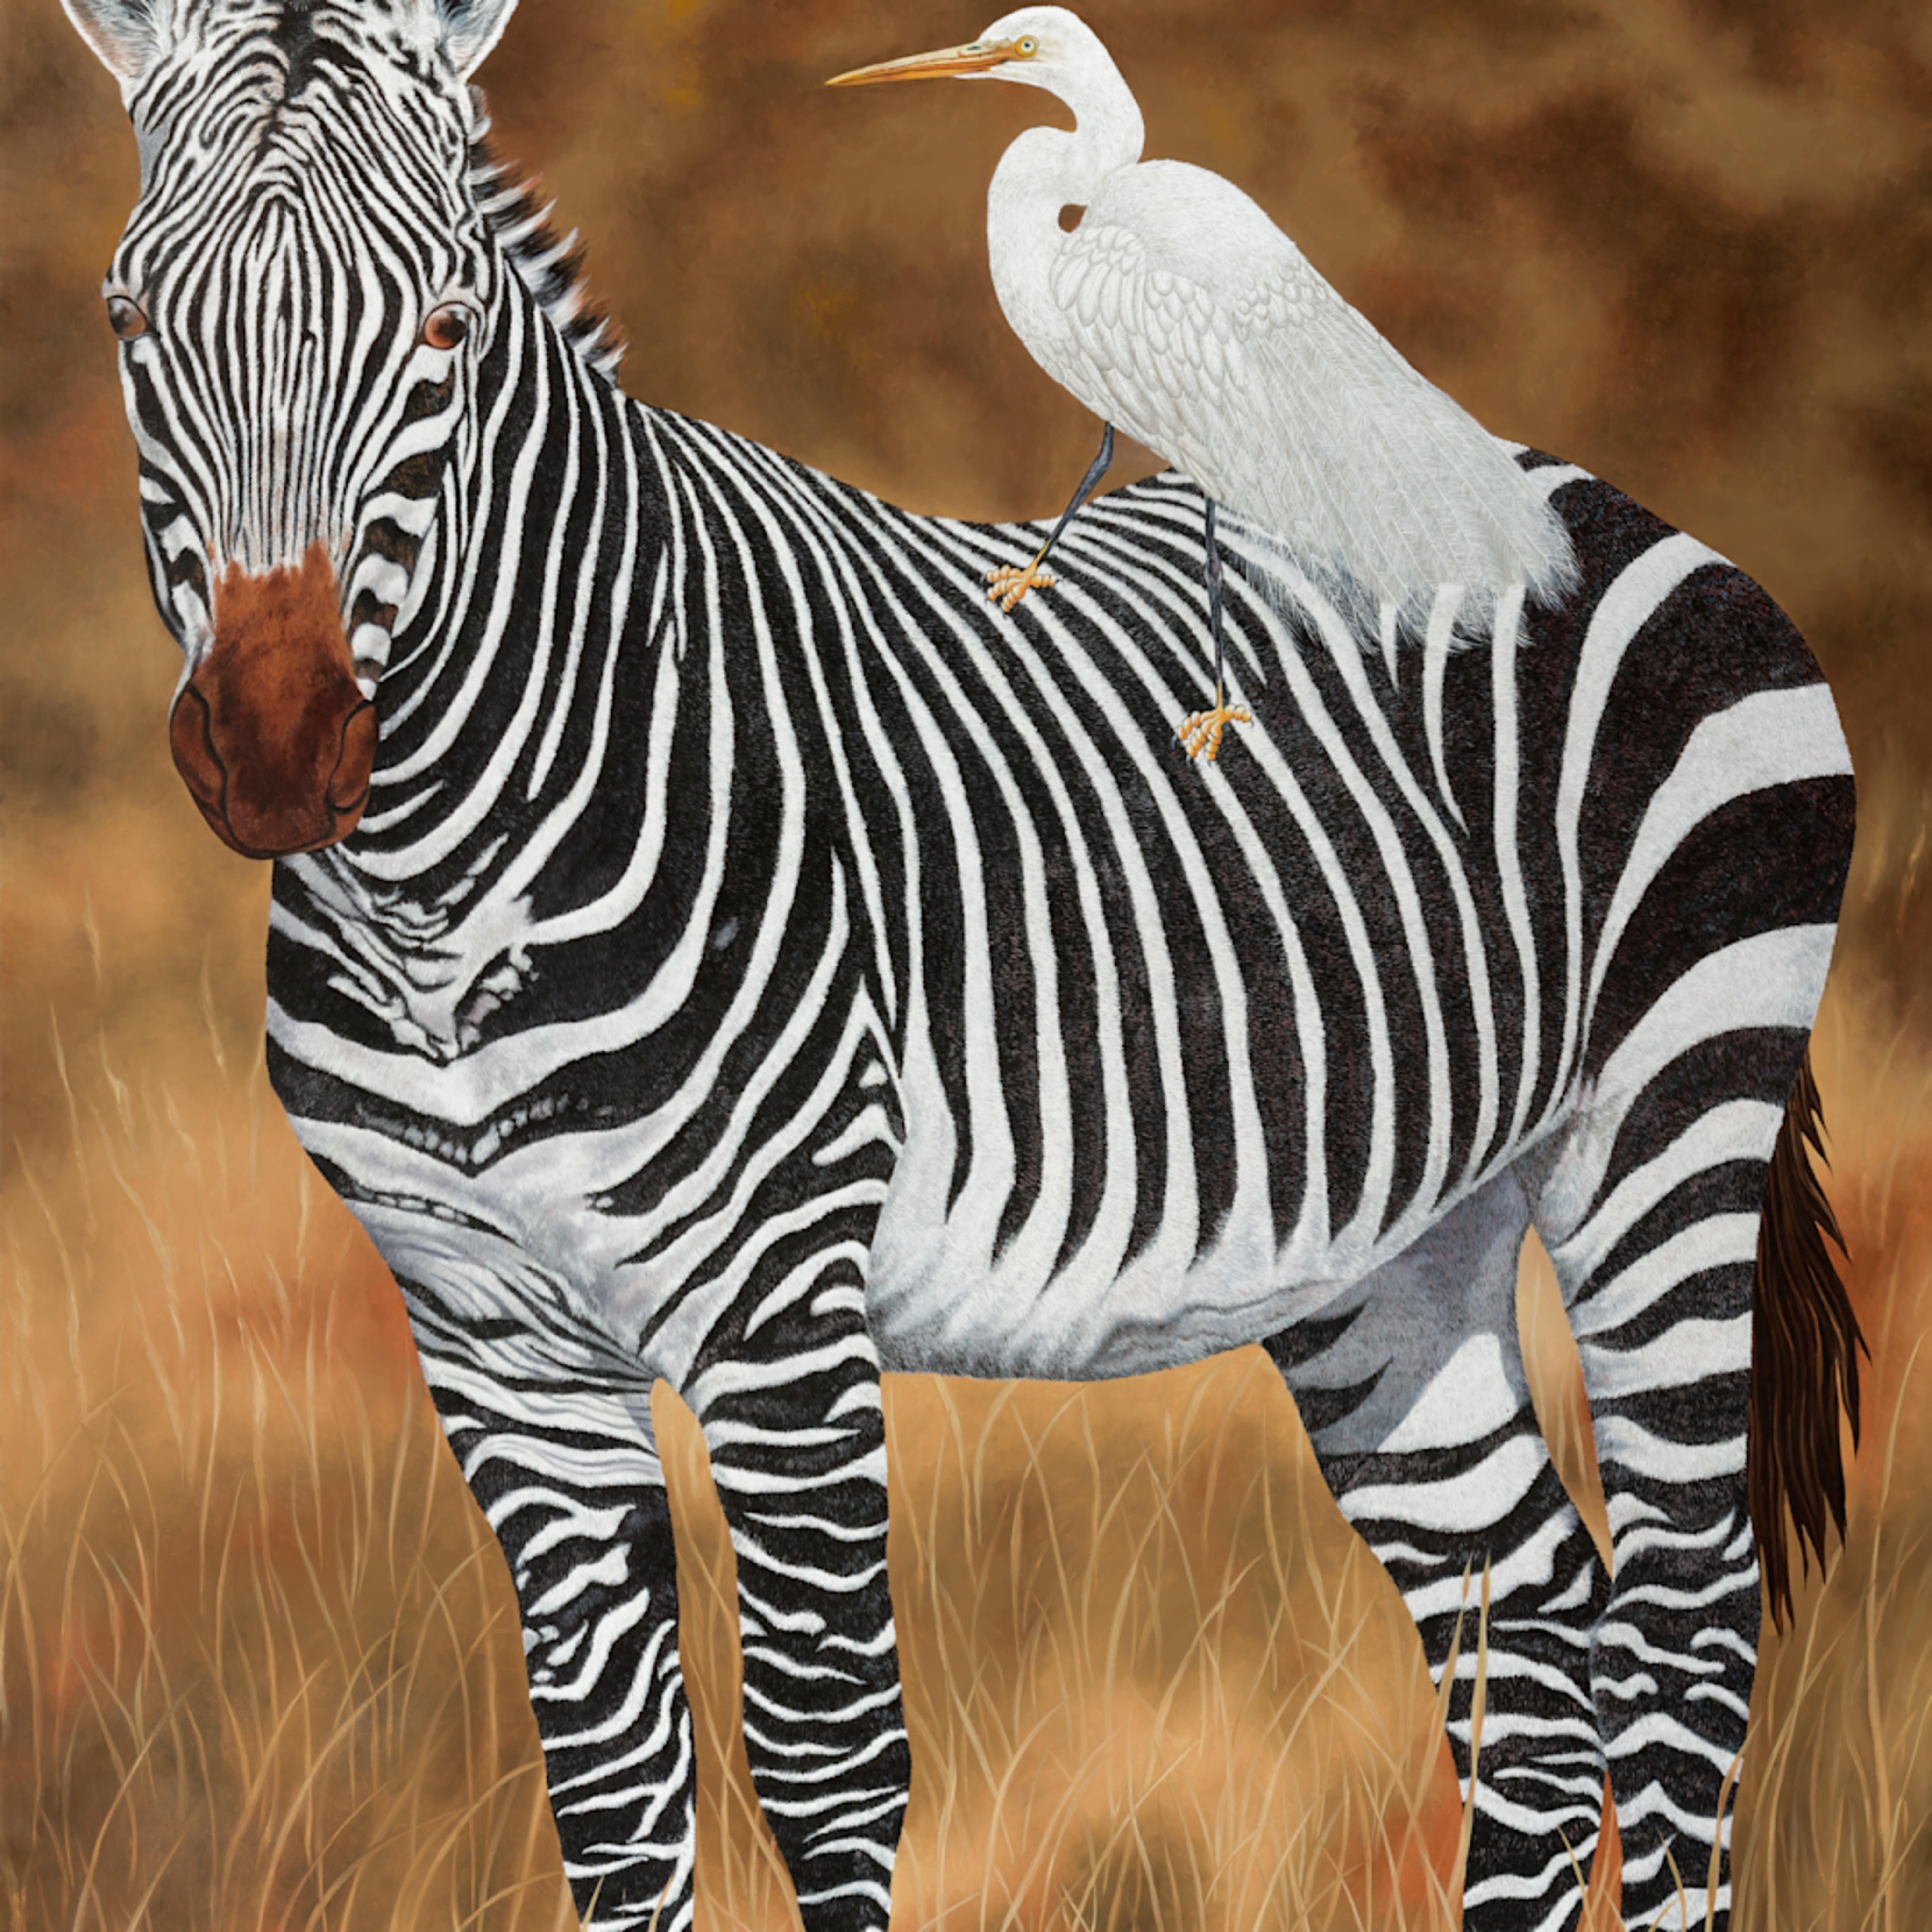 Zebra and egret stitched x3 sized 36 x 26 sharpenthe image12 2020 bfldjl